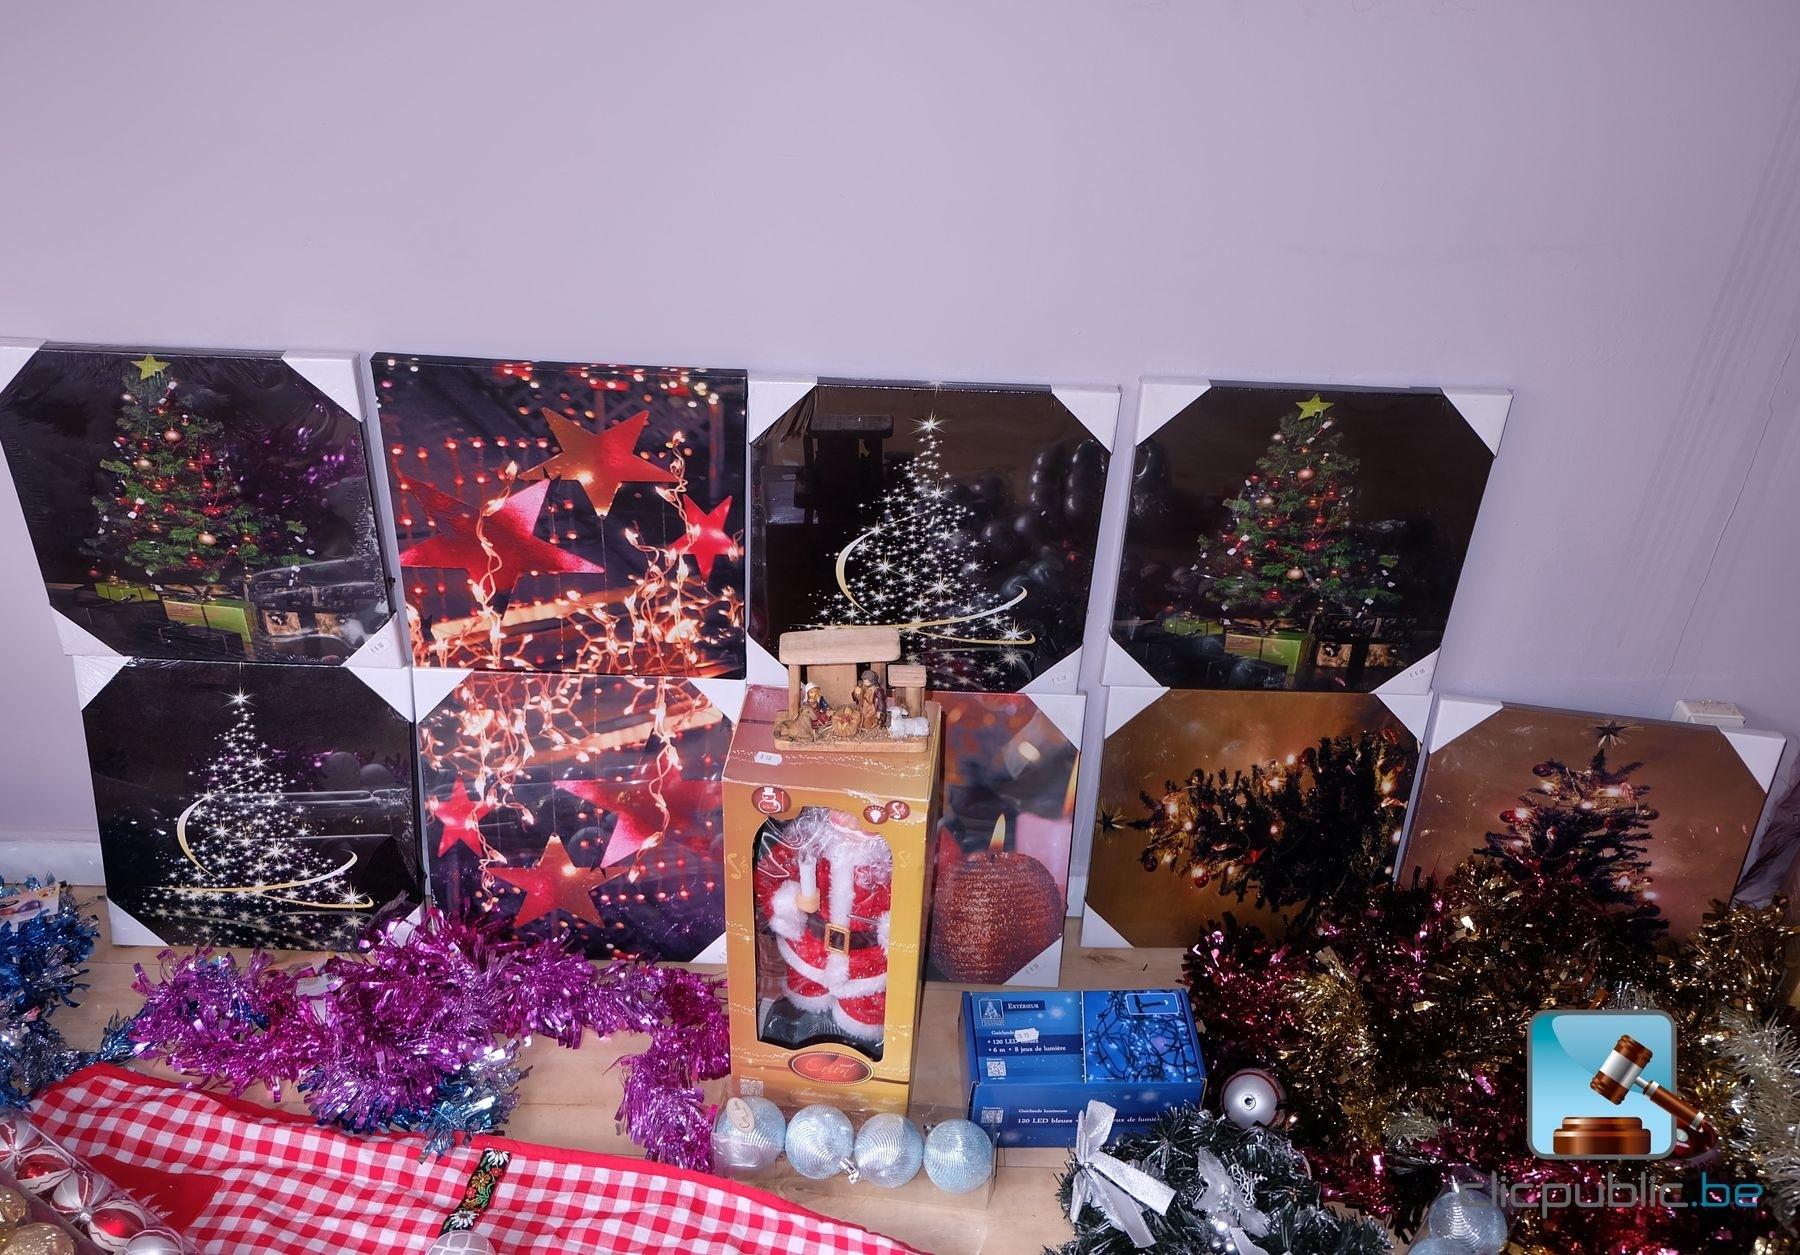 #A92238 Décorations De Noël (ref. 6) à Vendre Sur Clicpublic.be 5319 decorations de noel a vendre 1800x1255 px @ aertt.com